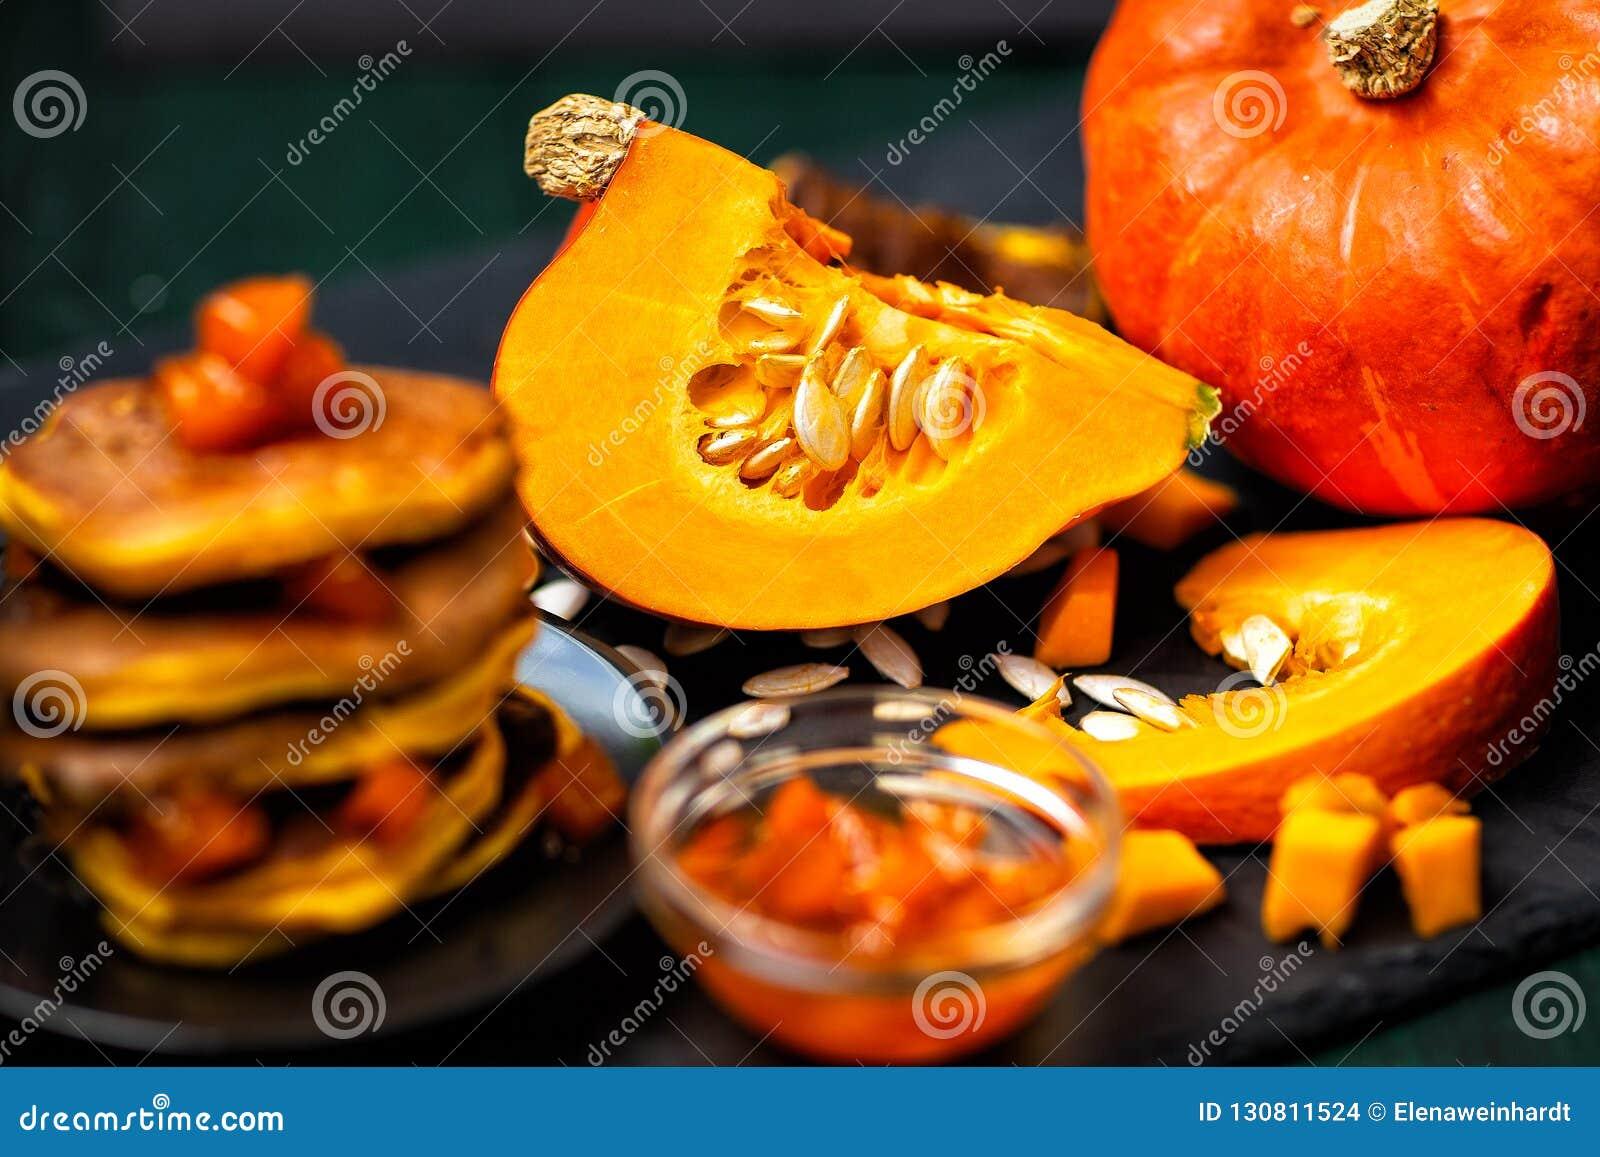 Pumpkin and pumpkin dishes.Jam and pumpkin pancakes.